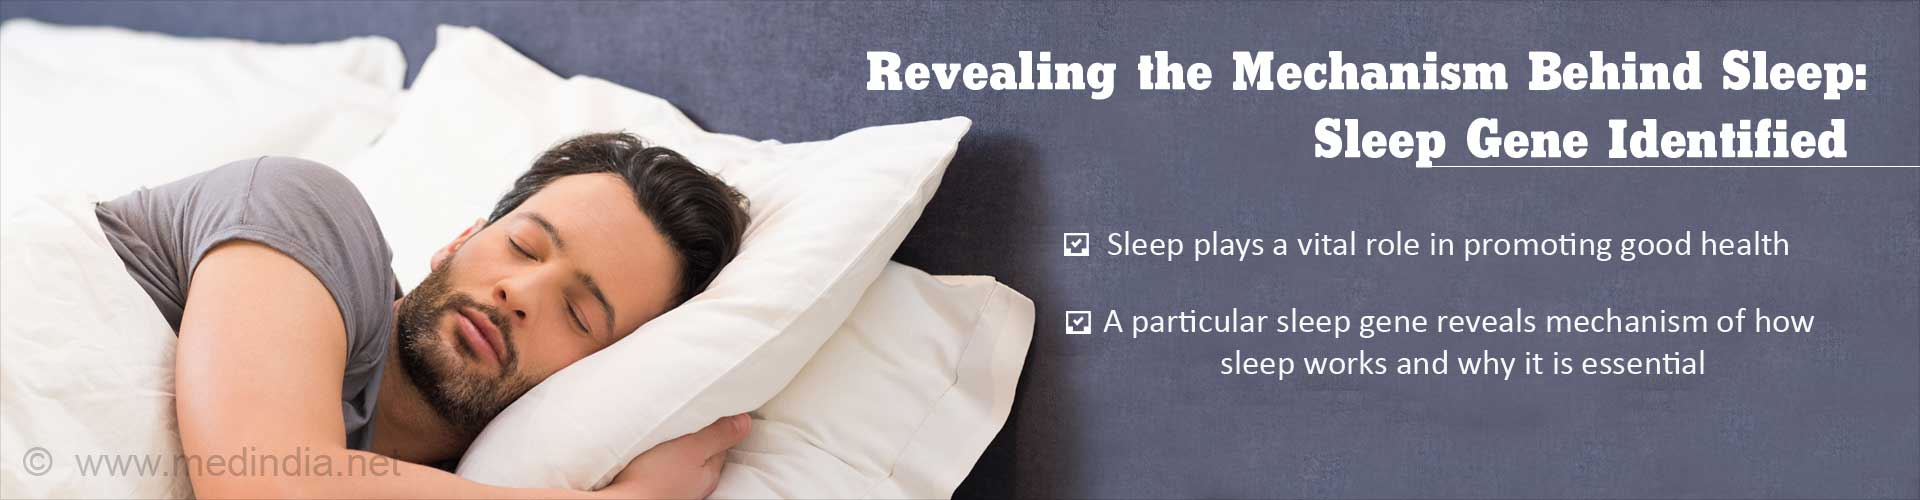 �Sleep Gene� Identified - Mechanism Reveals Why We Need Sleep